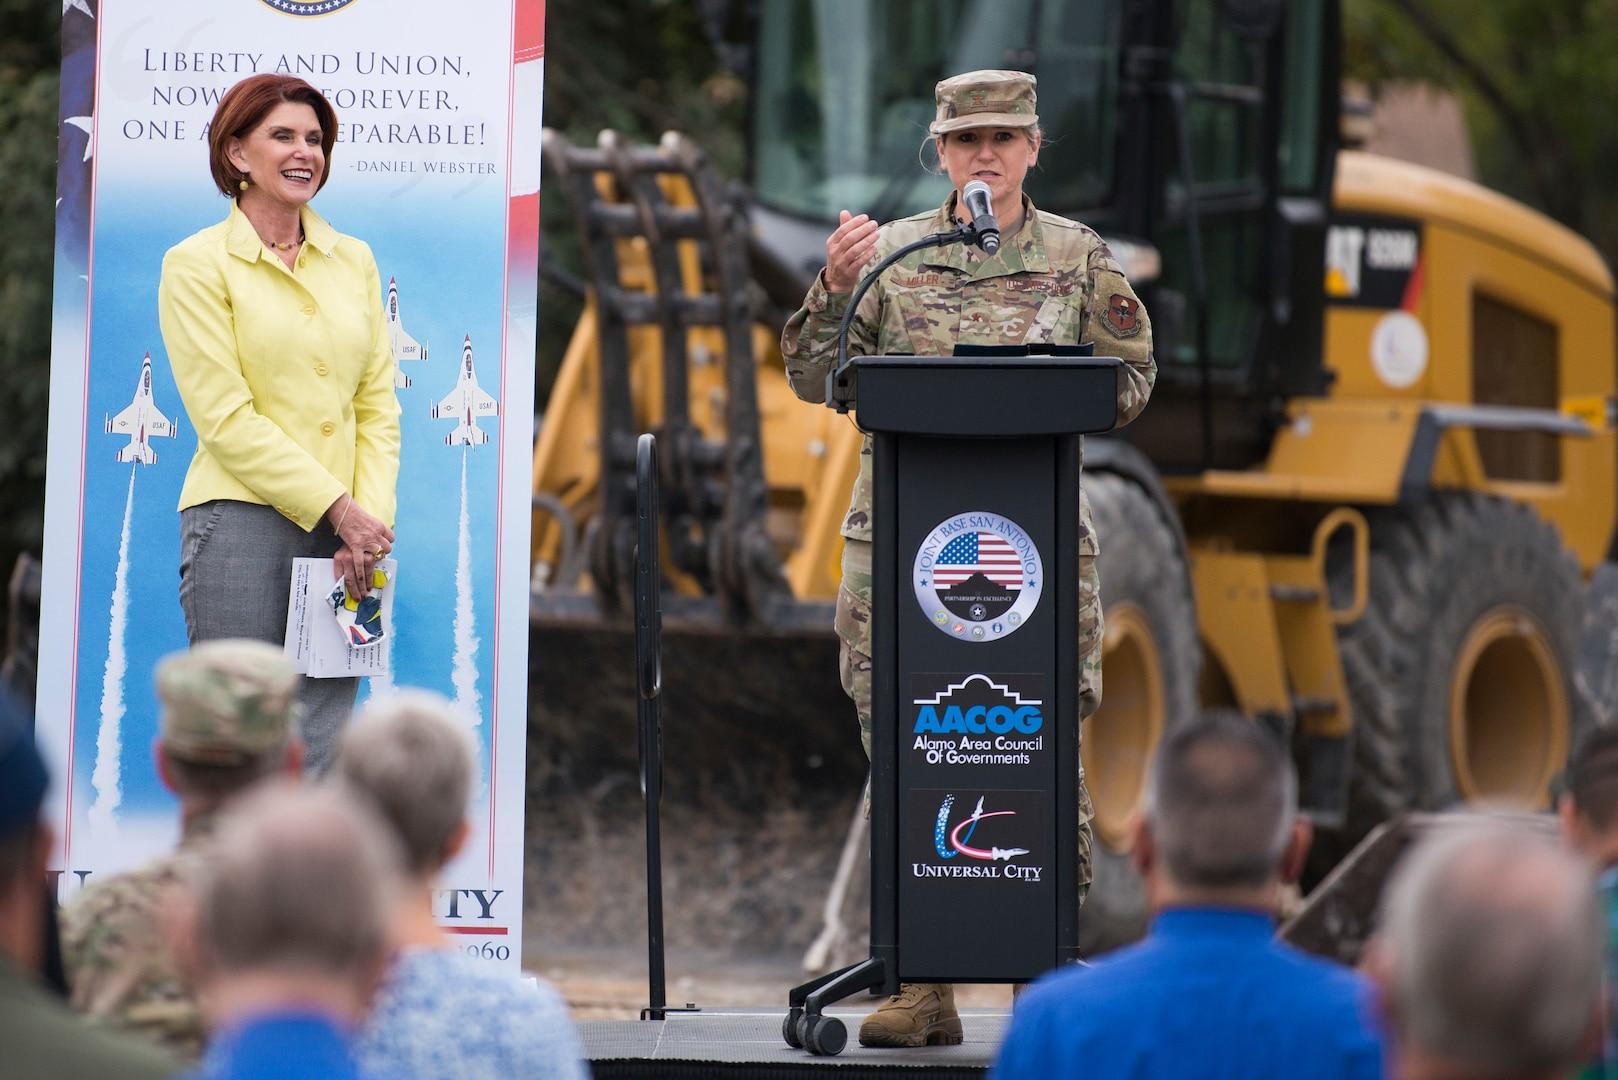 Brig. Gen. Caroline M. Miller, 502d Air Base Wing and Joint Base San Antonio commander, speaks during the Lindbergh Demolition Project partnership recognition event, Nov. 10, 2020, in Universal City, Texas.